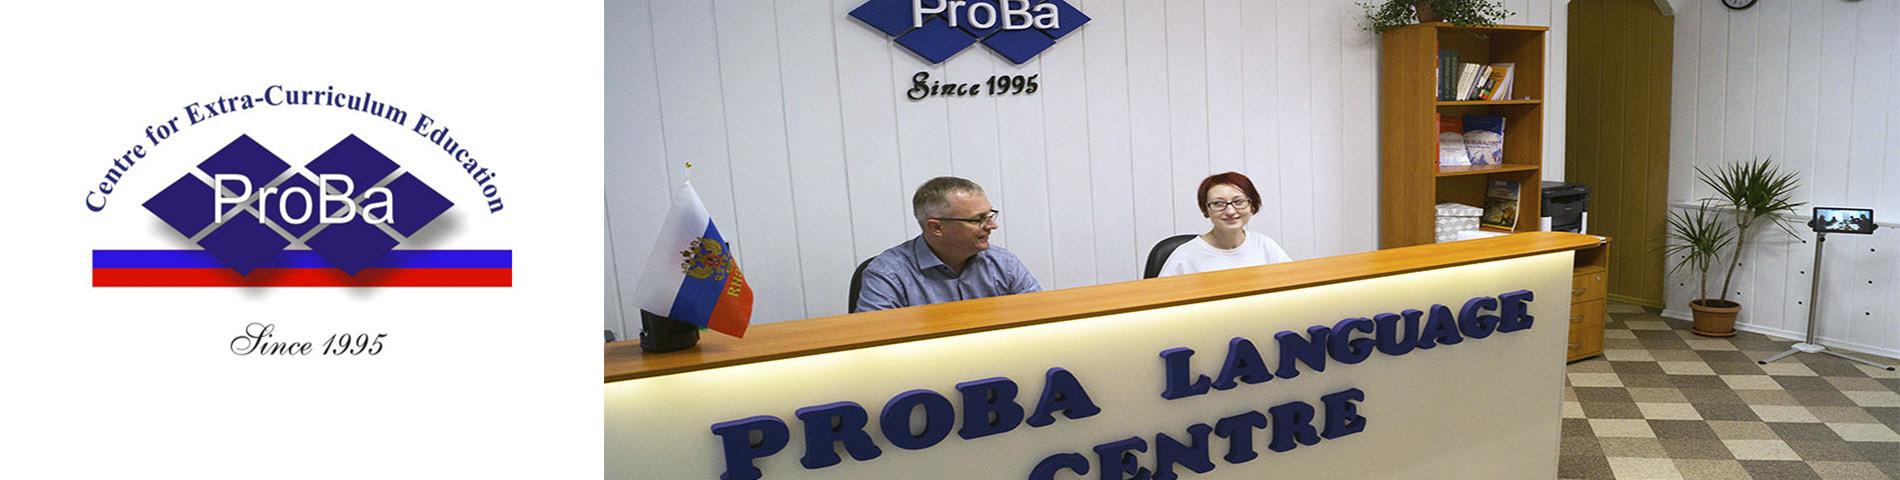 ProBa Educational Centre afbeelding 1